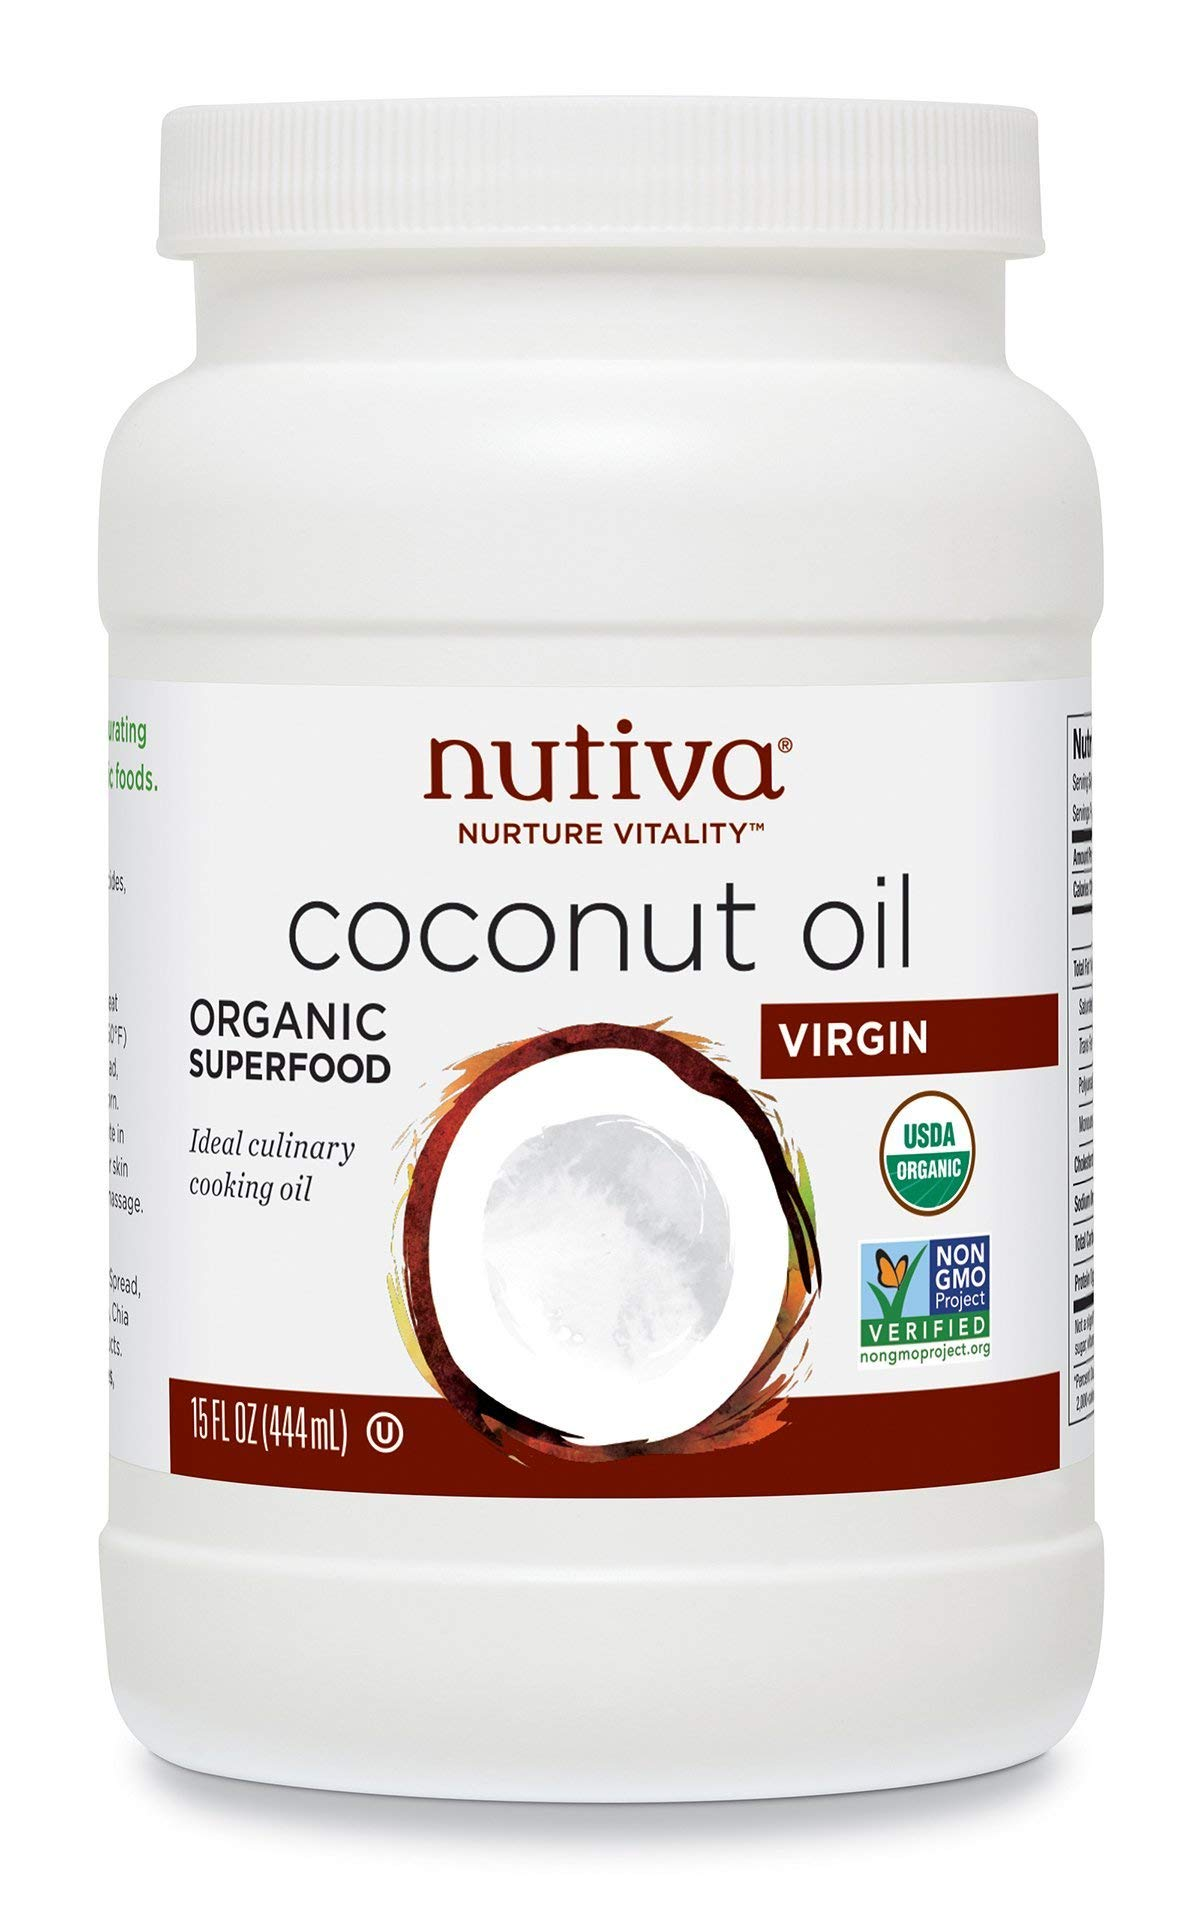 Nutiva Organic, Unrefined, Virgin Coconut Oil, 15 Fl Oz (Pack of 1) by Nutiva